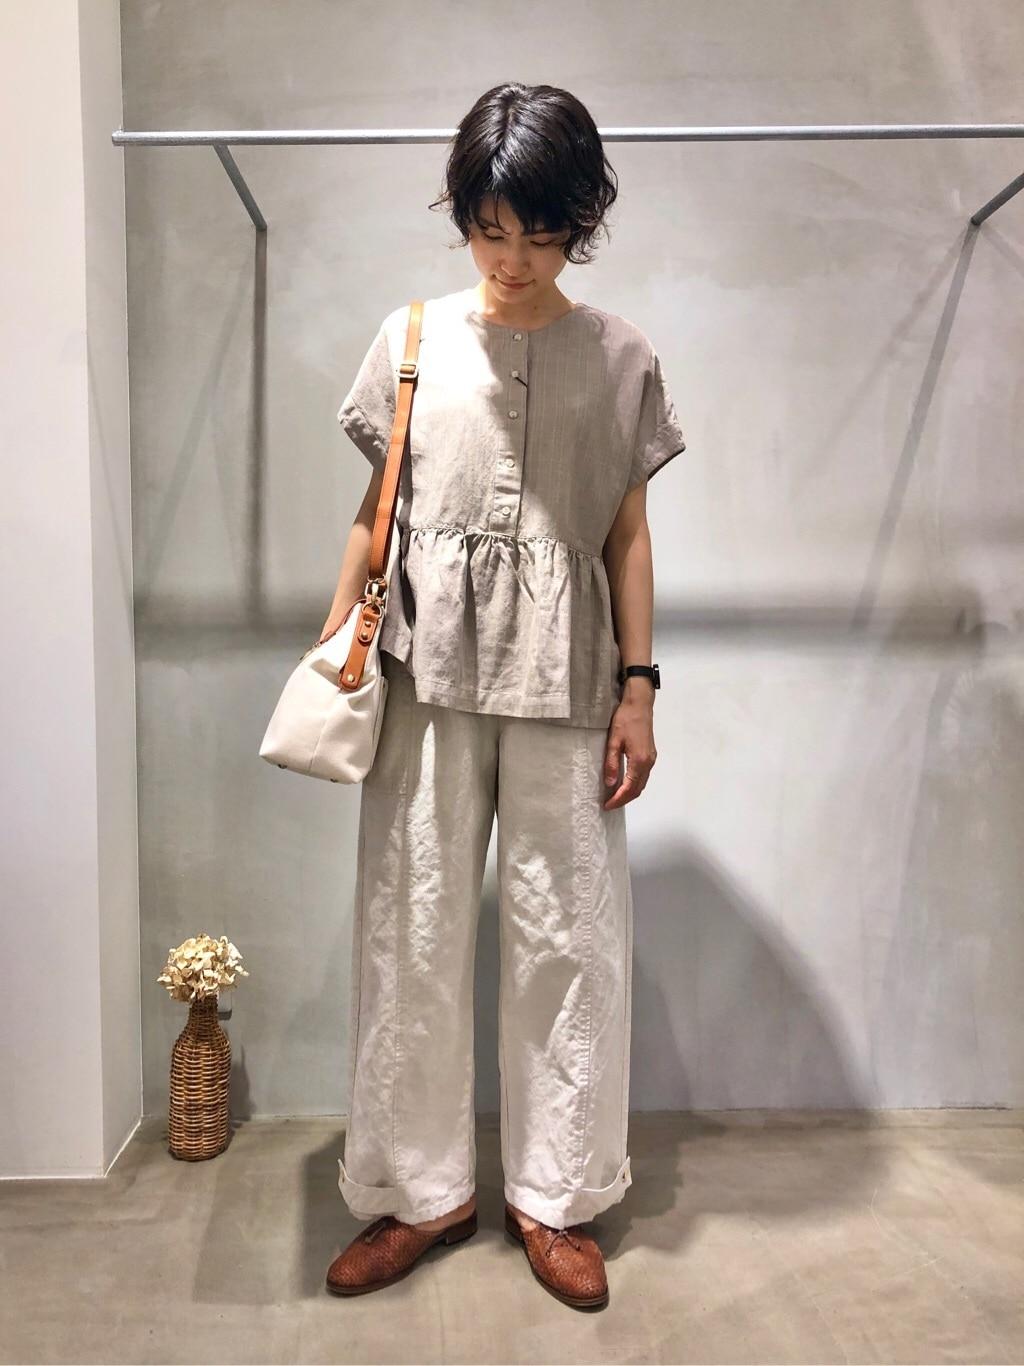 yuni / bulle de savon 京都路面 身長:159cm 2020.08.01